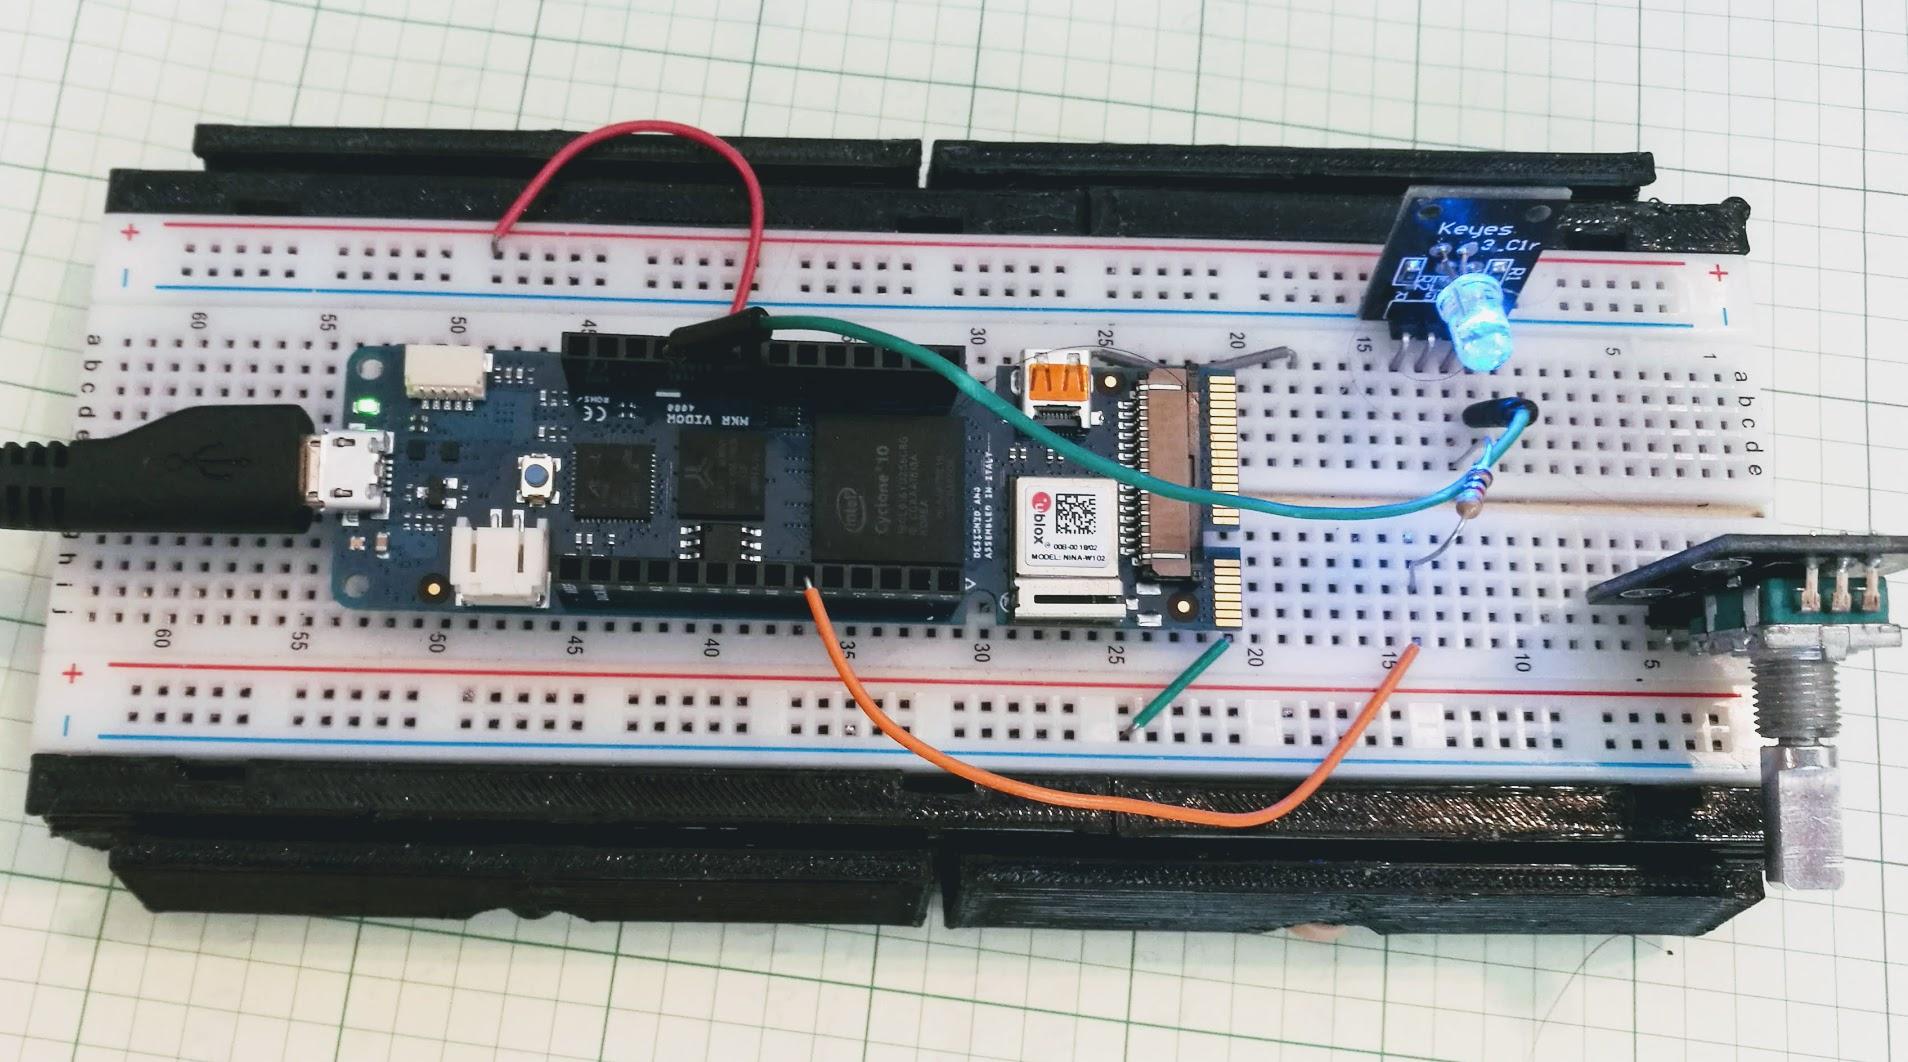 Hands-On With New Arduino FPGA Board: MKR Vidor 4000 | Hackaday